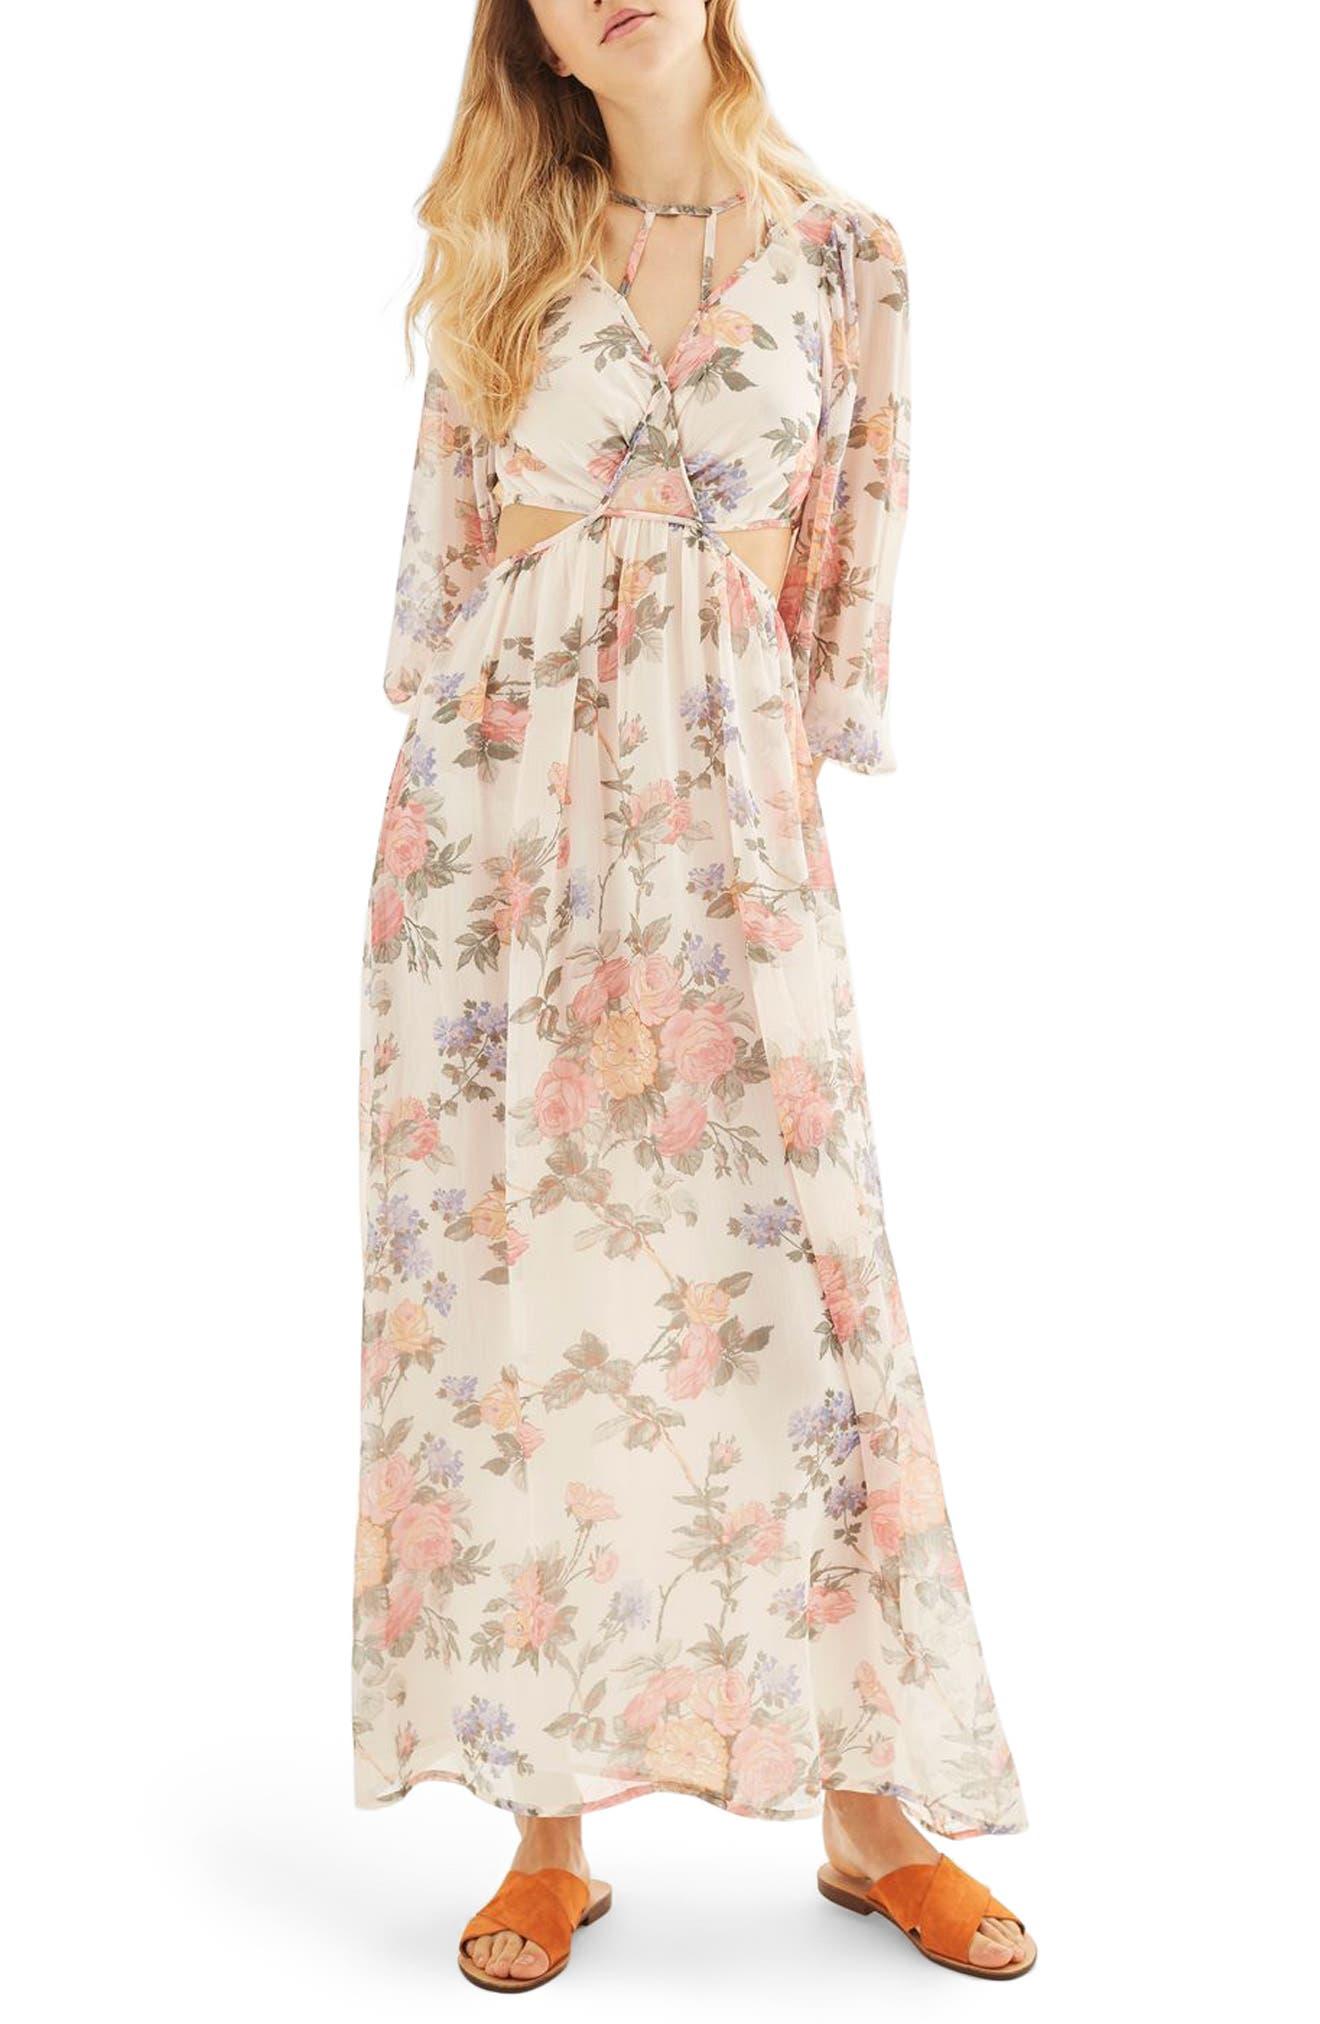 Topshop Crinkle Floral Maxi Dress